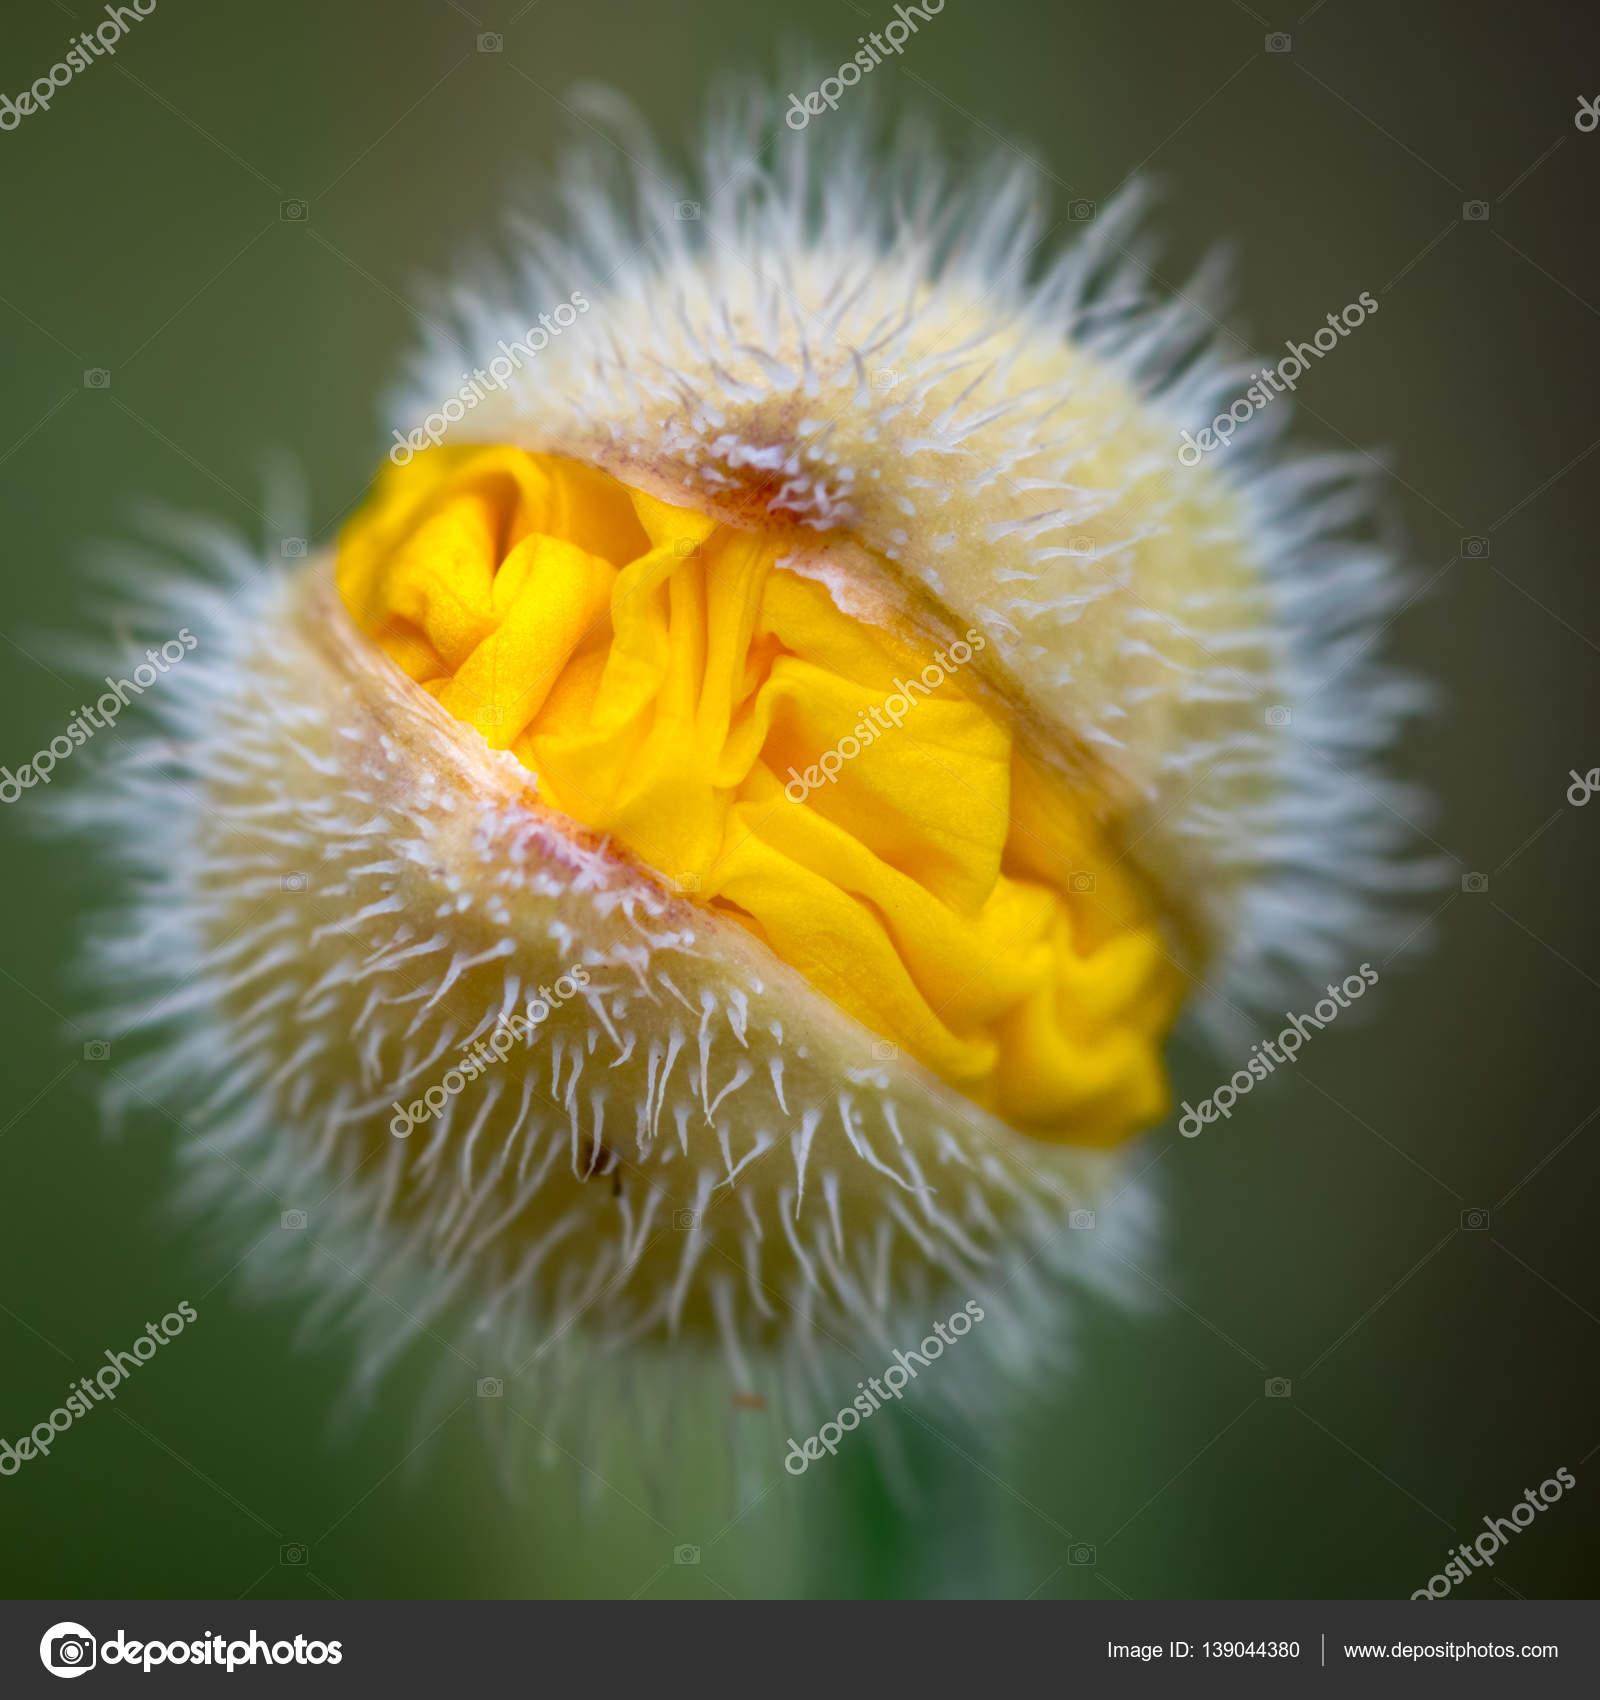 Yellow poppy flower head stock photo bearacreative 139044380 yellow poppy flower head stock photo mightylinksfo Choice Image